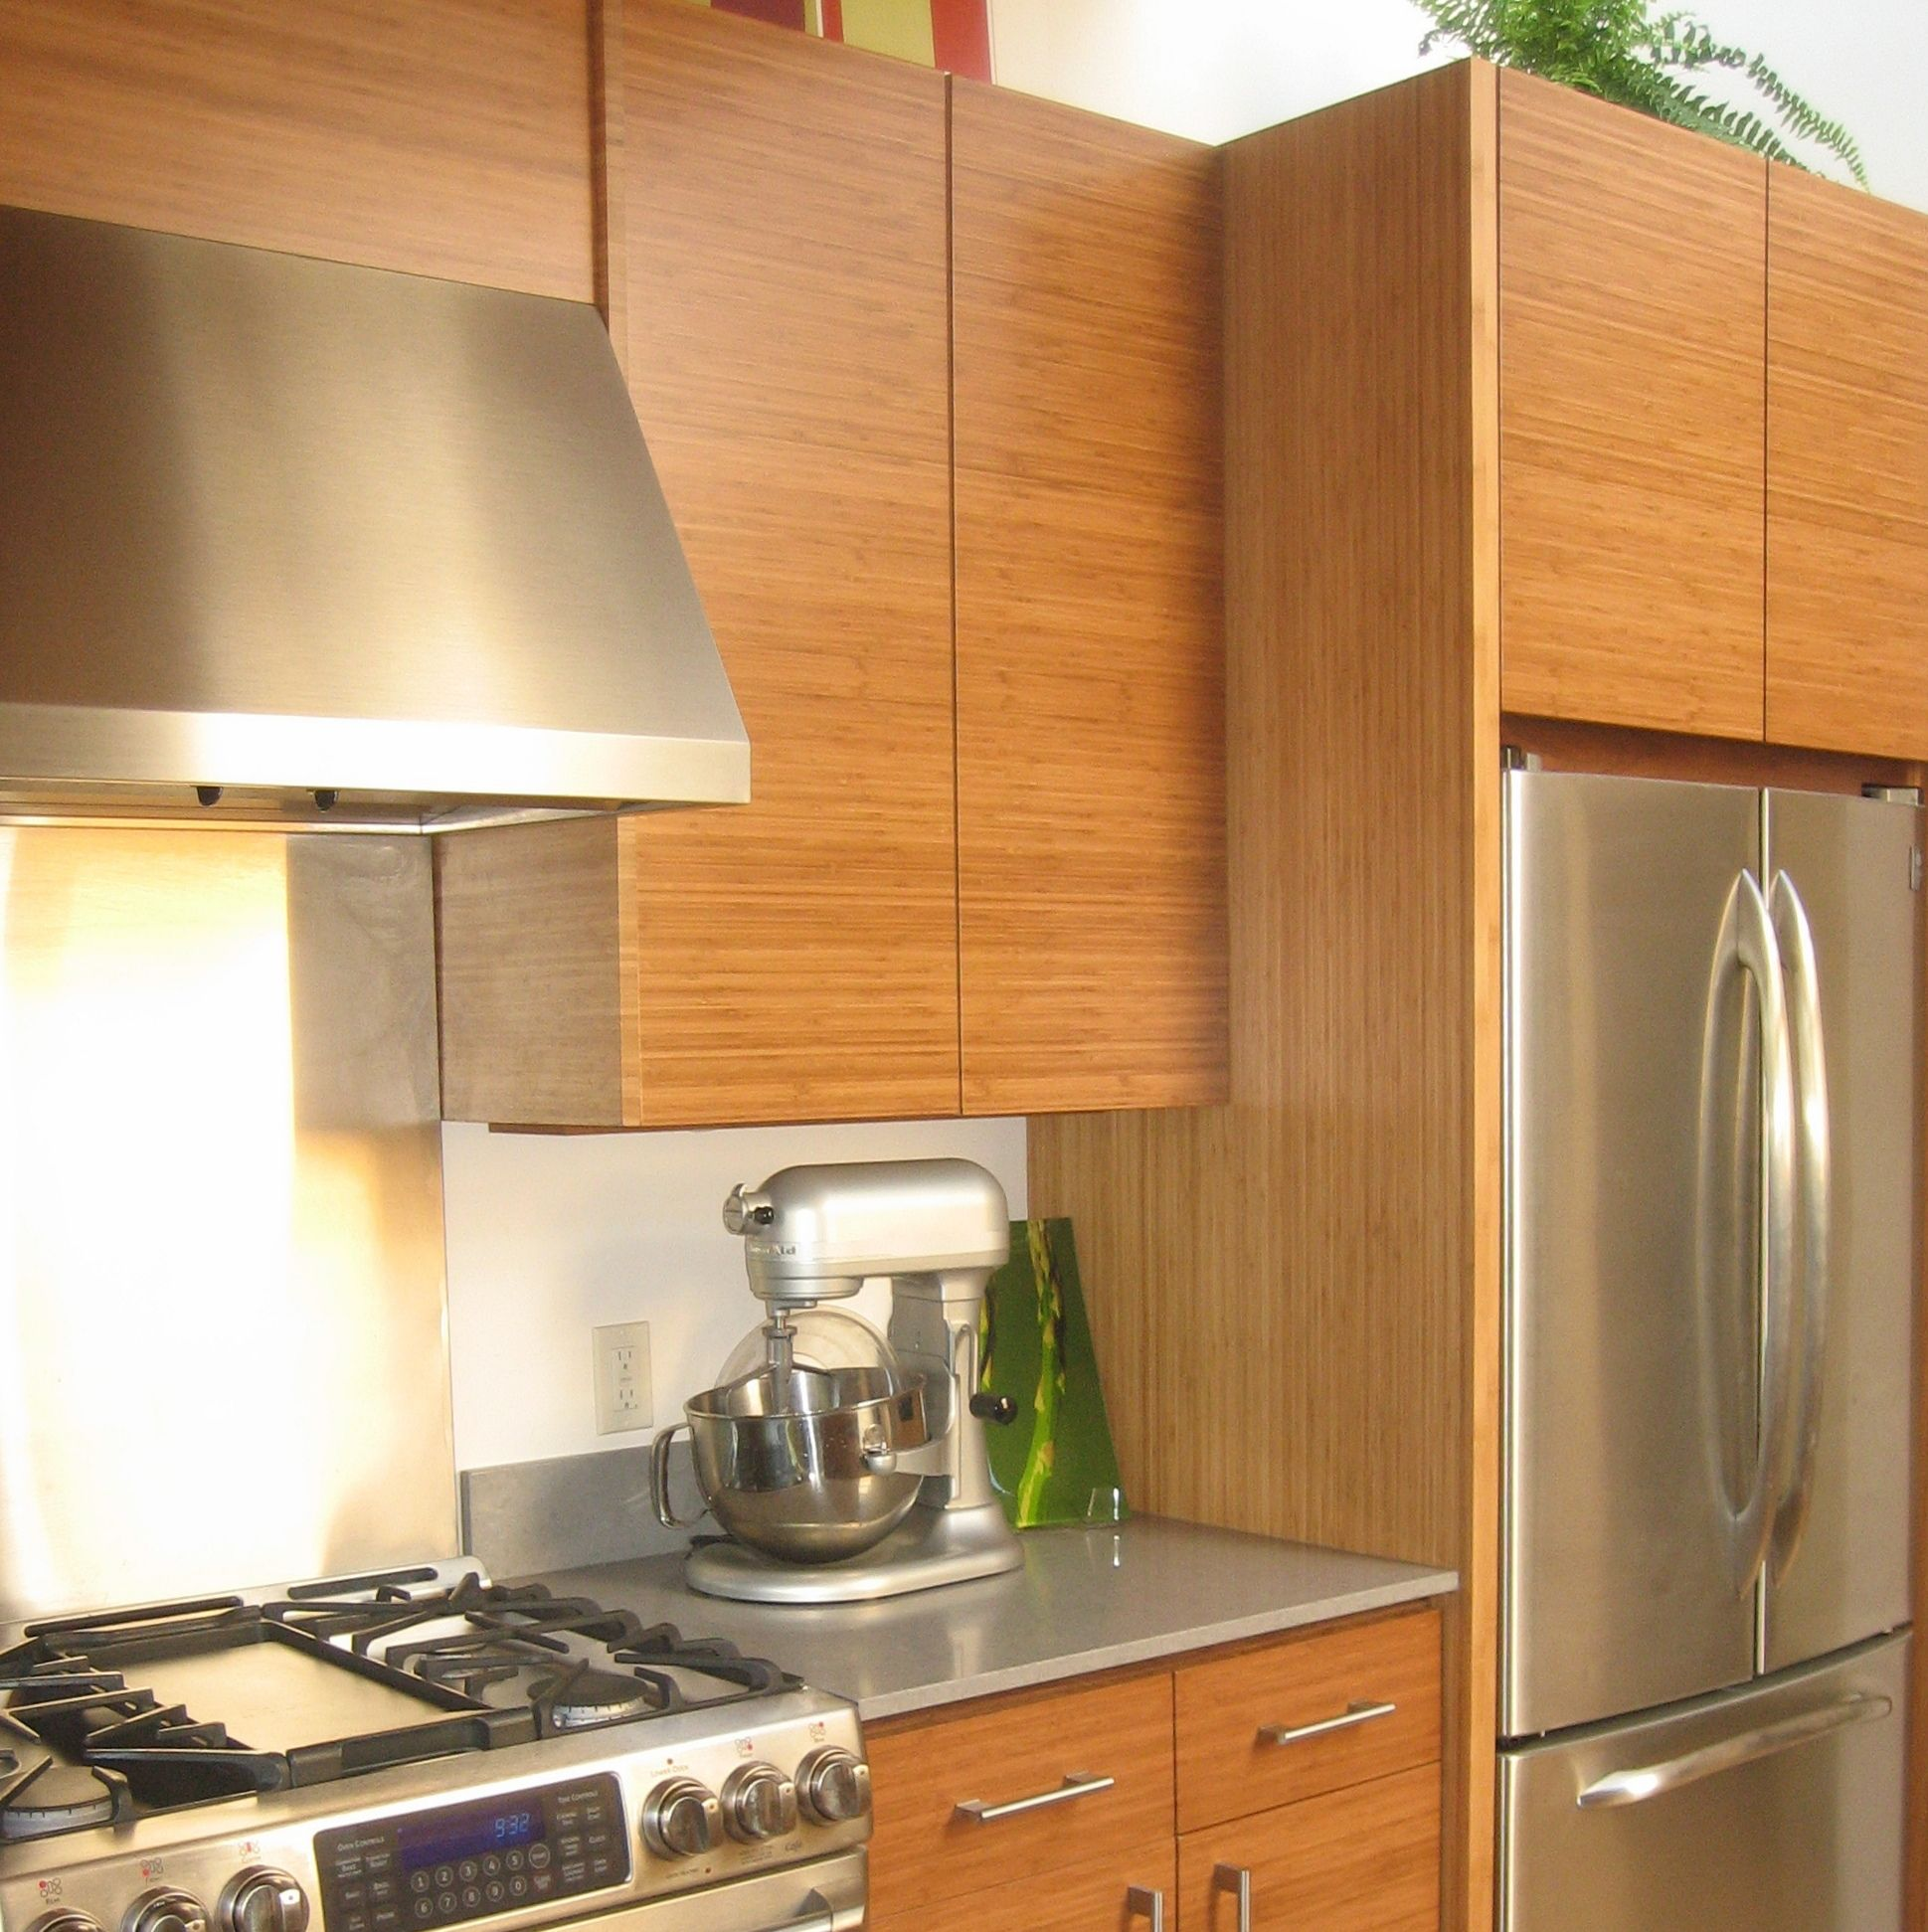 IKEA® kitchen with Semihandmade Bamboo fronts. Kitchen